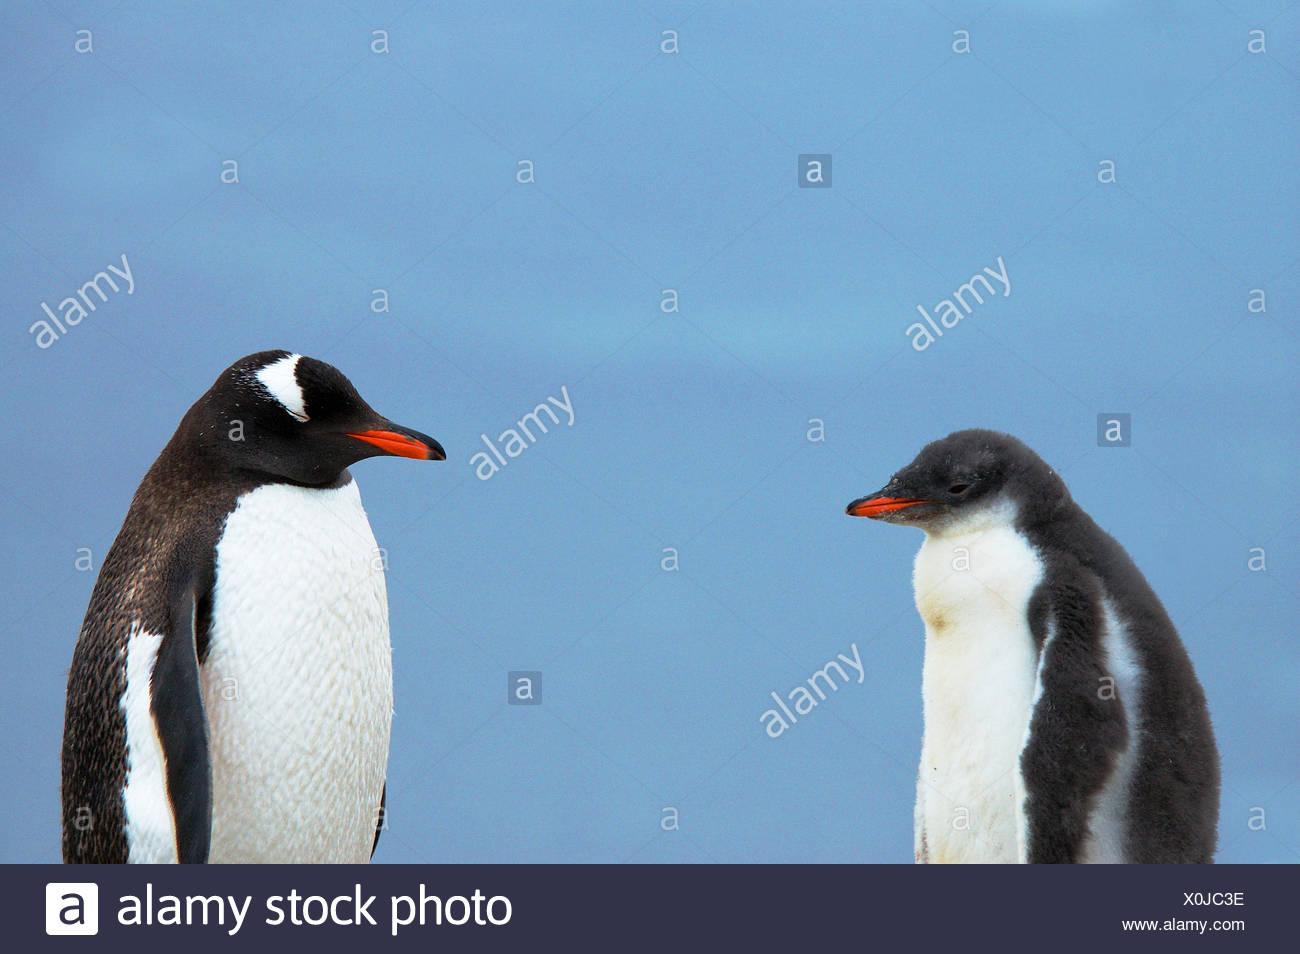 Gentoo Penguin (Pygoscelis papua) adult with chick, Antarctica. Stock Photo